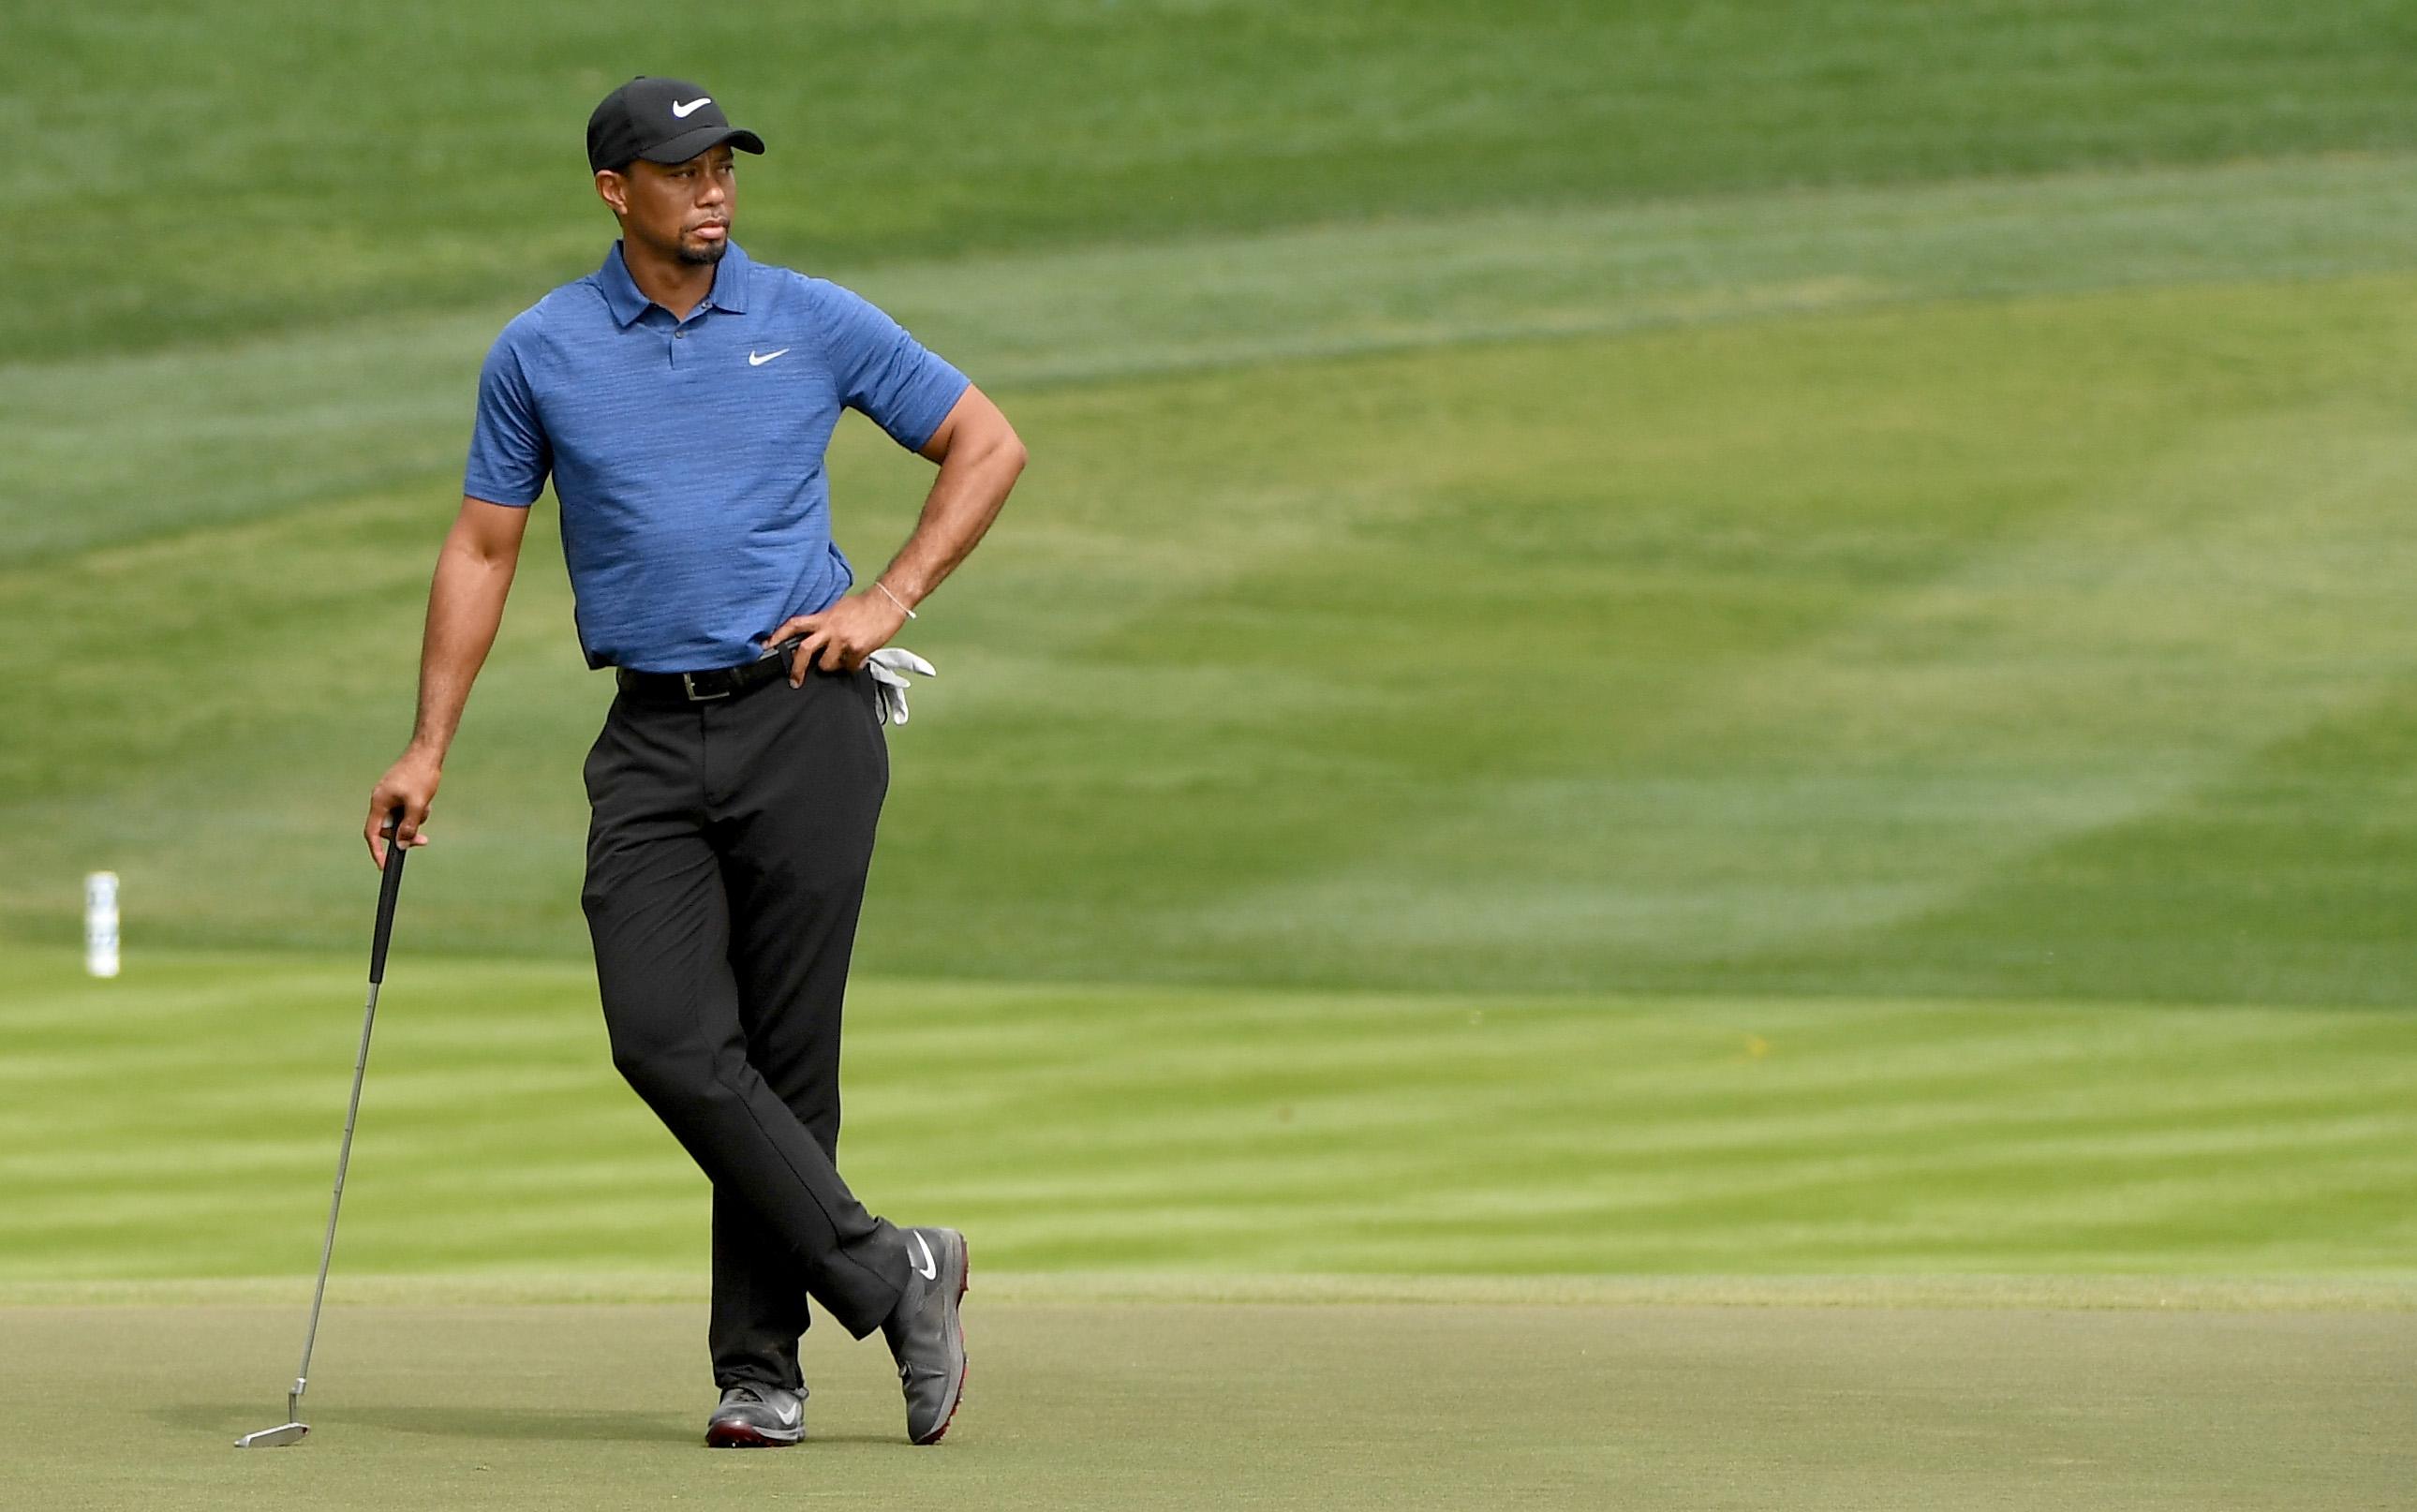 Tiger Woods durante el Omega Dubai Desert Classic este 2 de febrero. (Crédito: Ross Kinnaird/Getty Images)